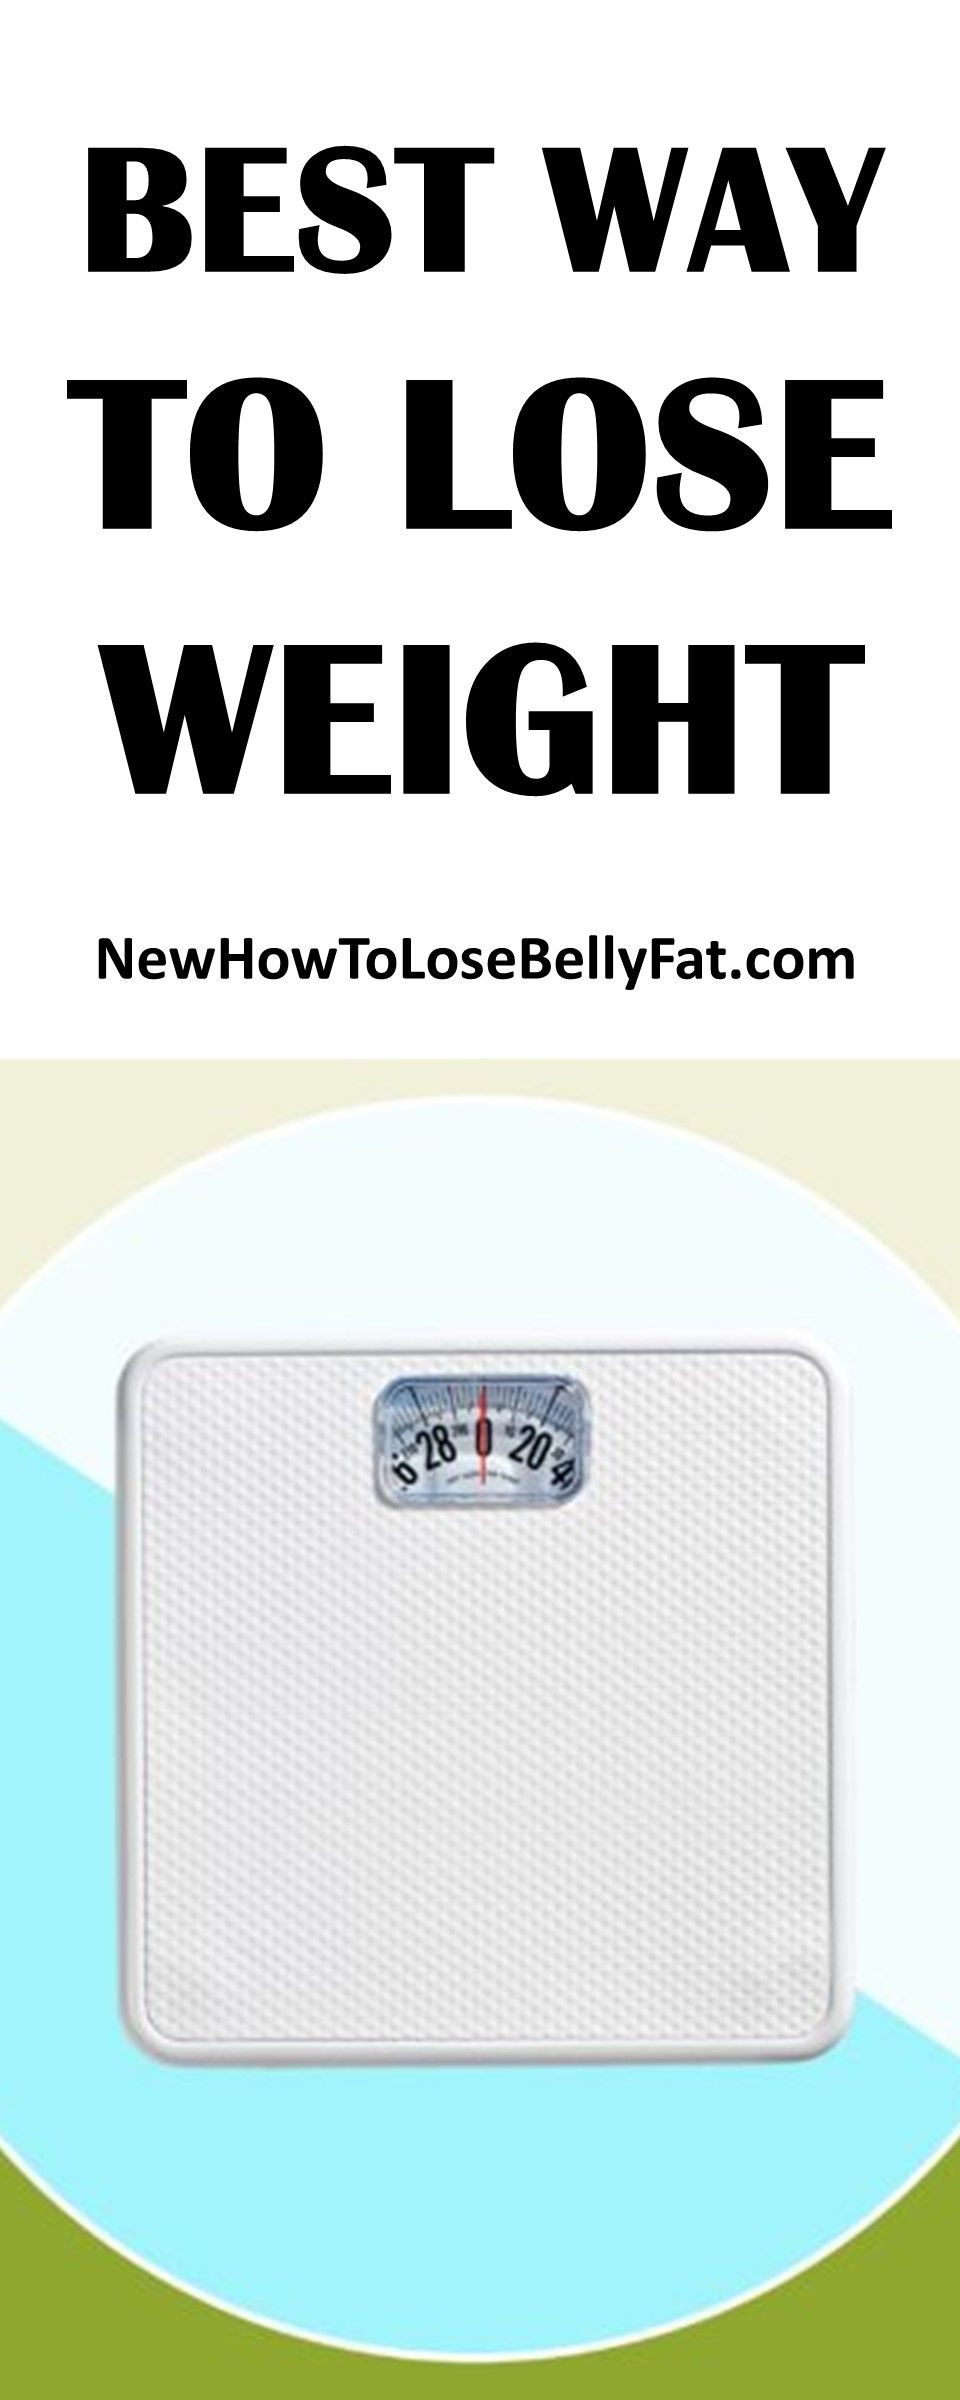 Eat chocolate lose weight pdf image 4